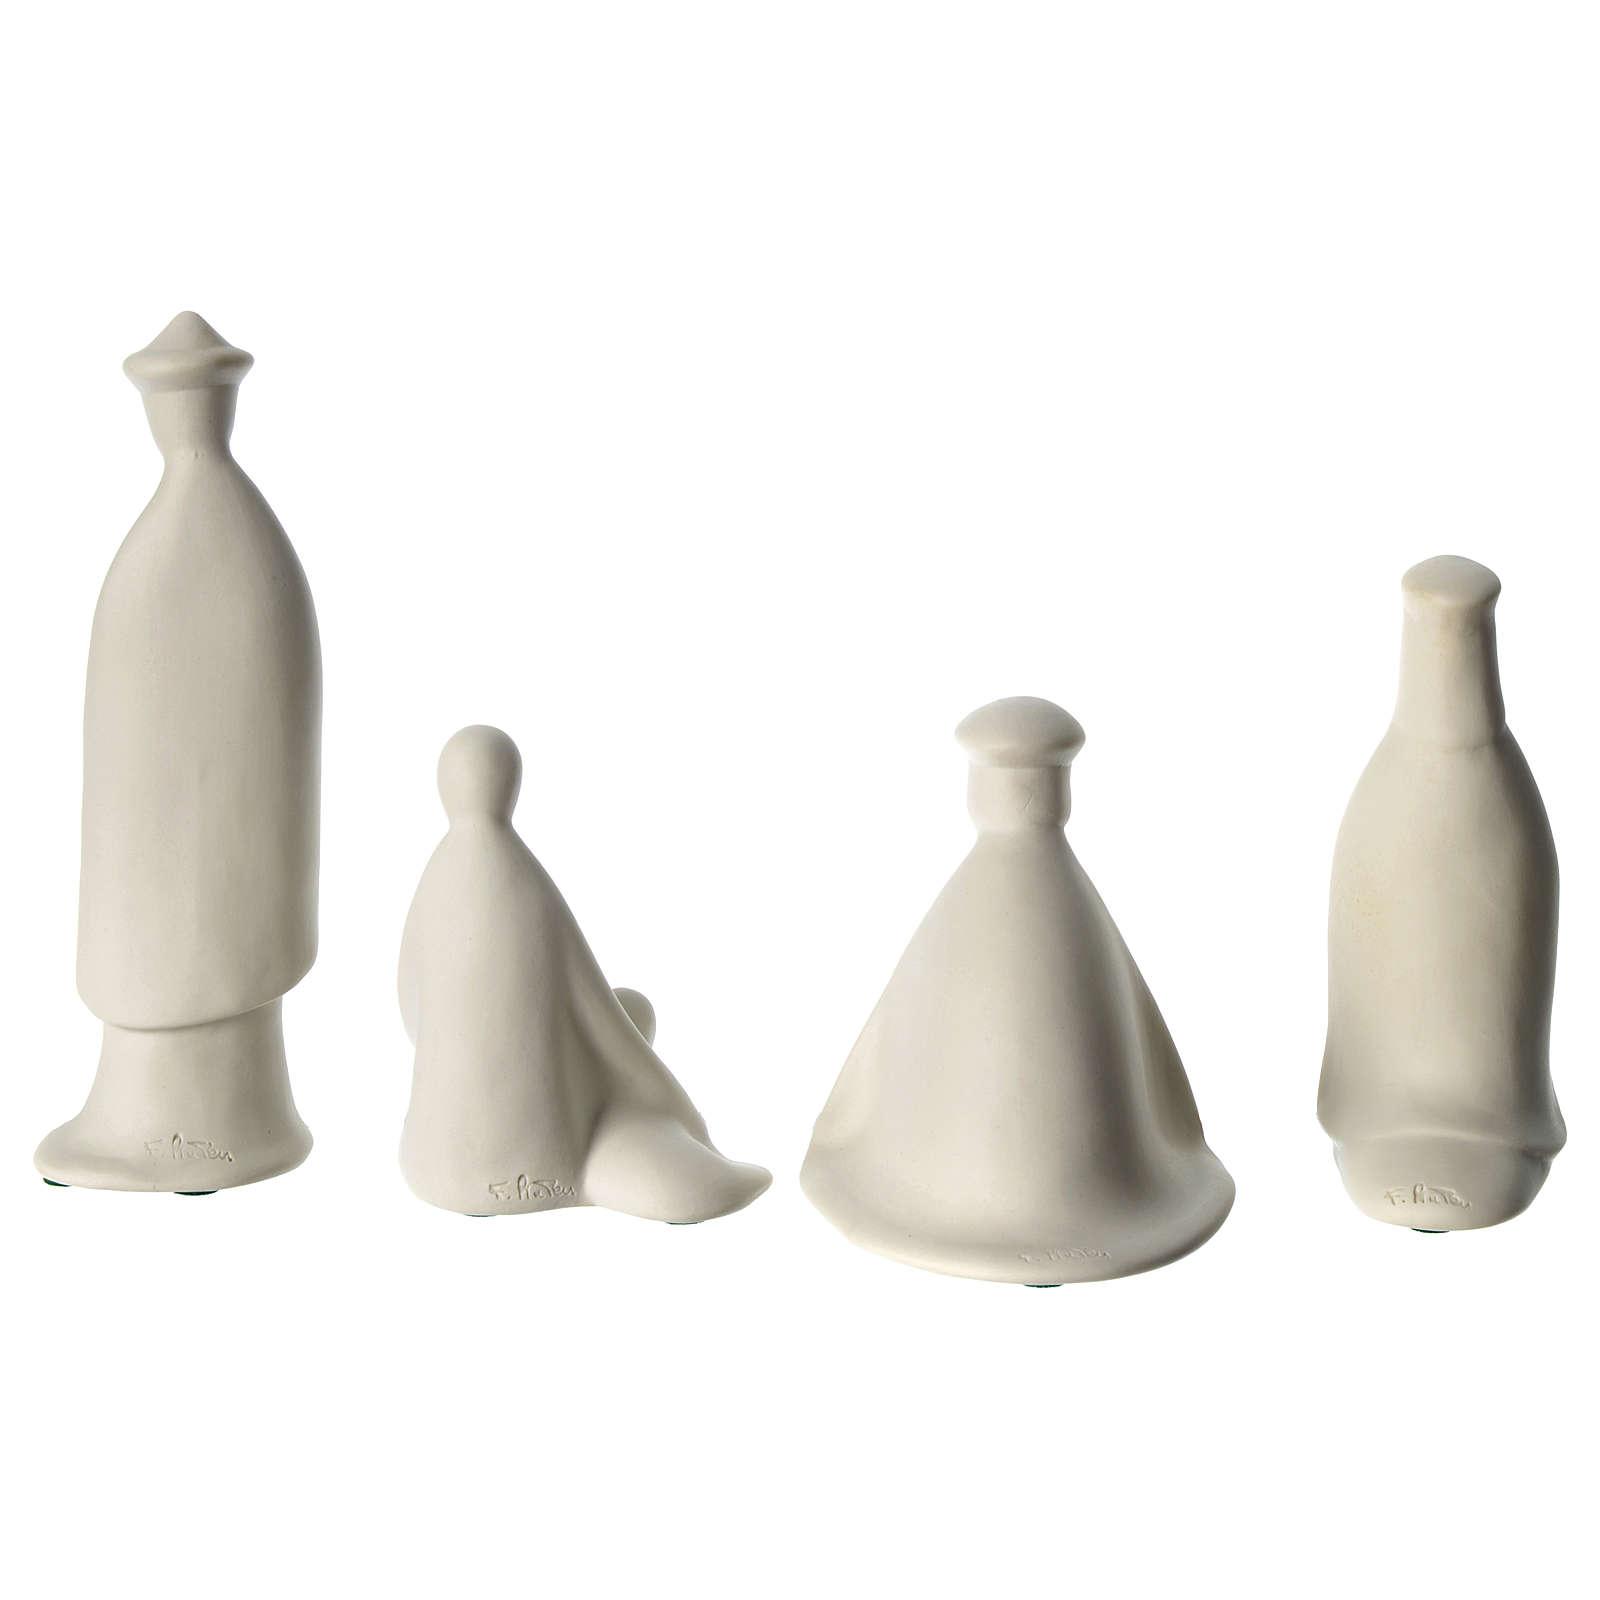 Tre re e pastore porcellana per presepe 16 cm Francesco Pinton 4